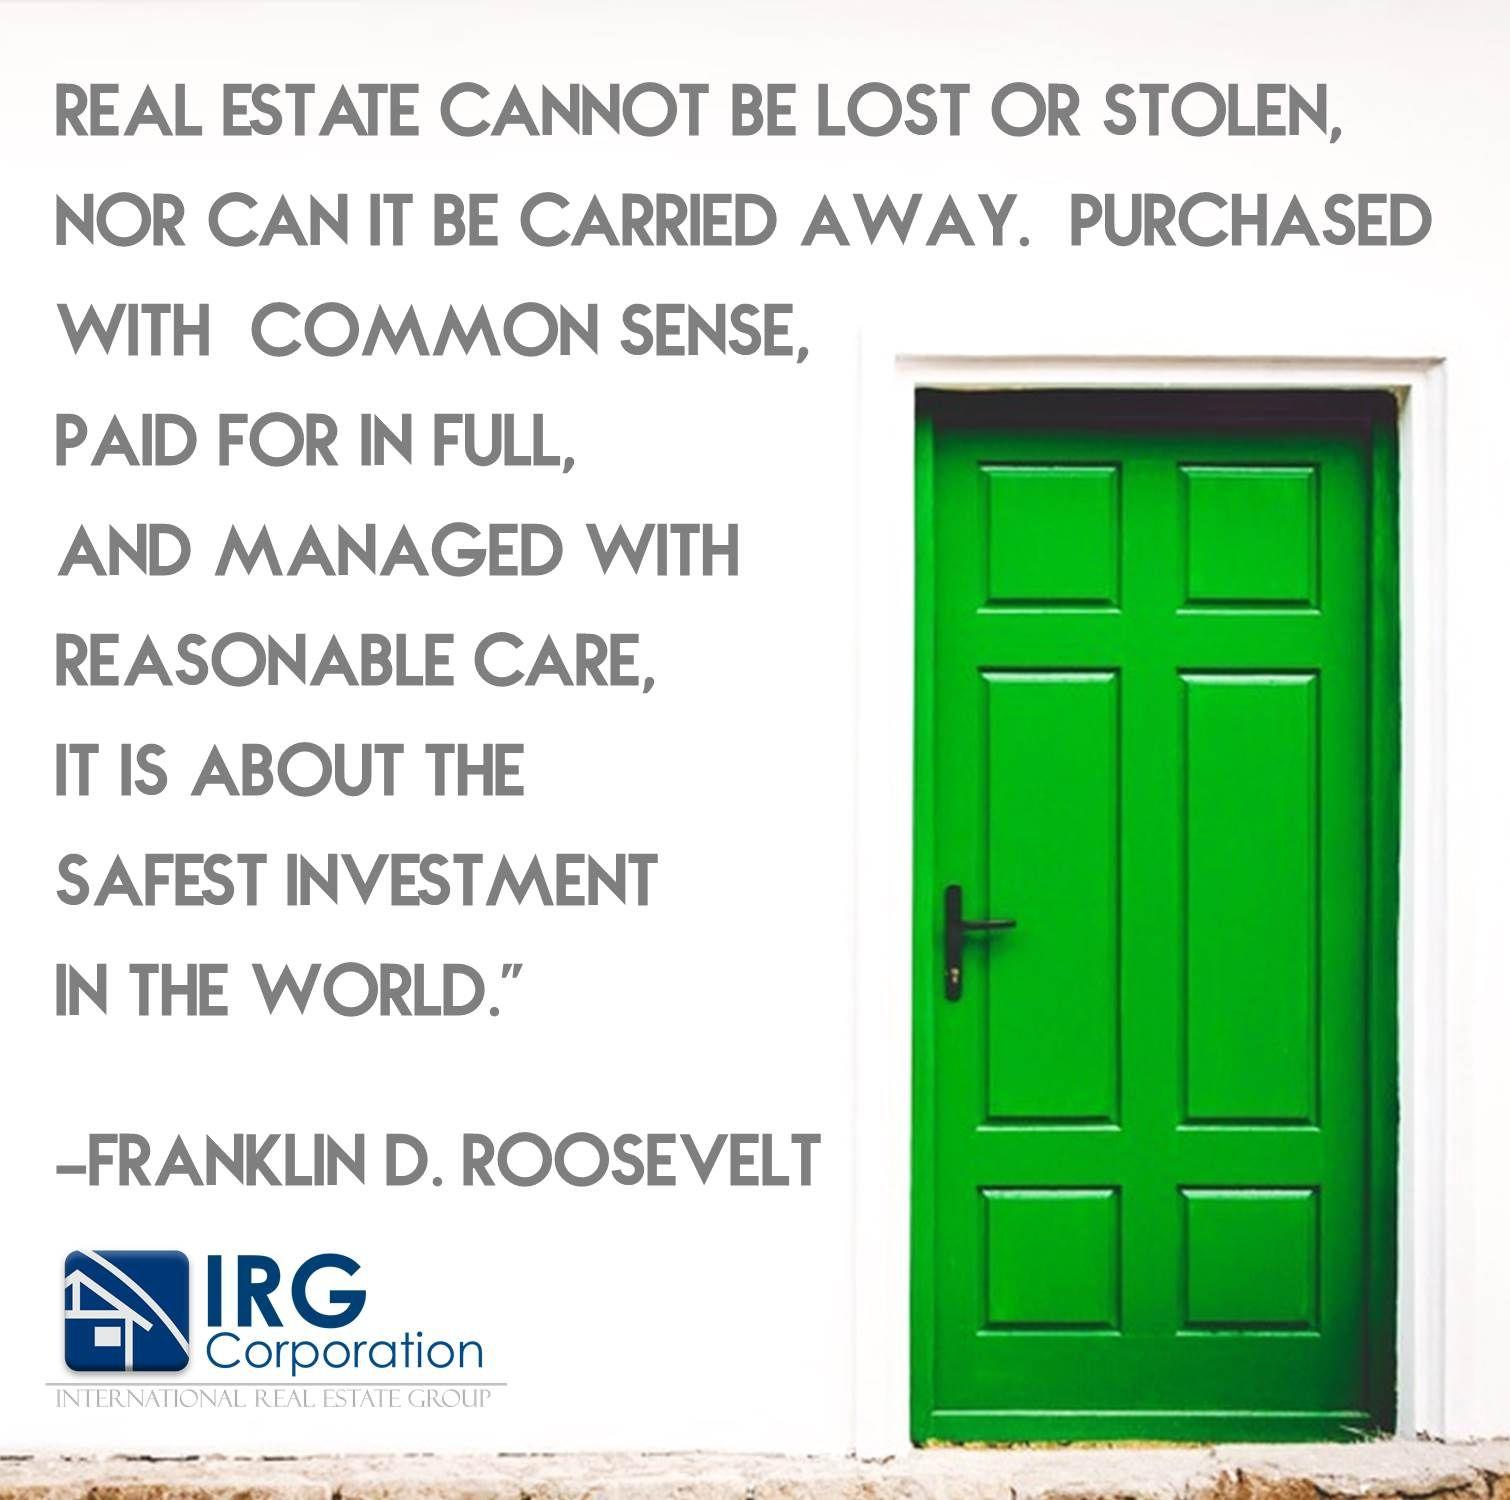 RealEstate Realtor RealEstateAgent WeBuyHouses www